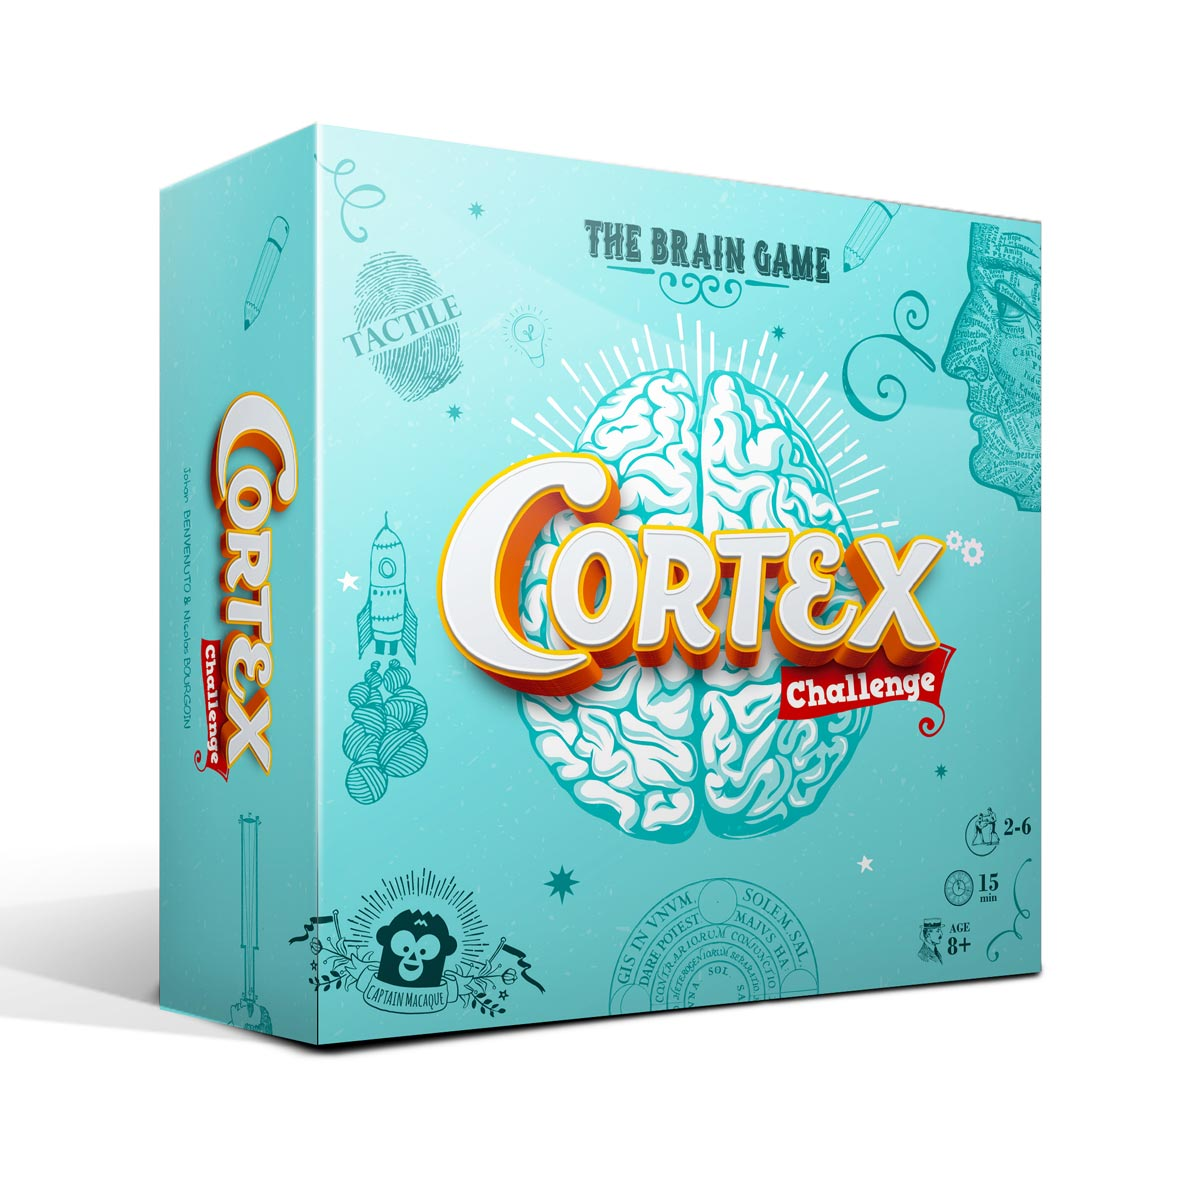 Cortex 1